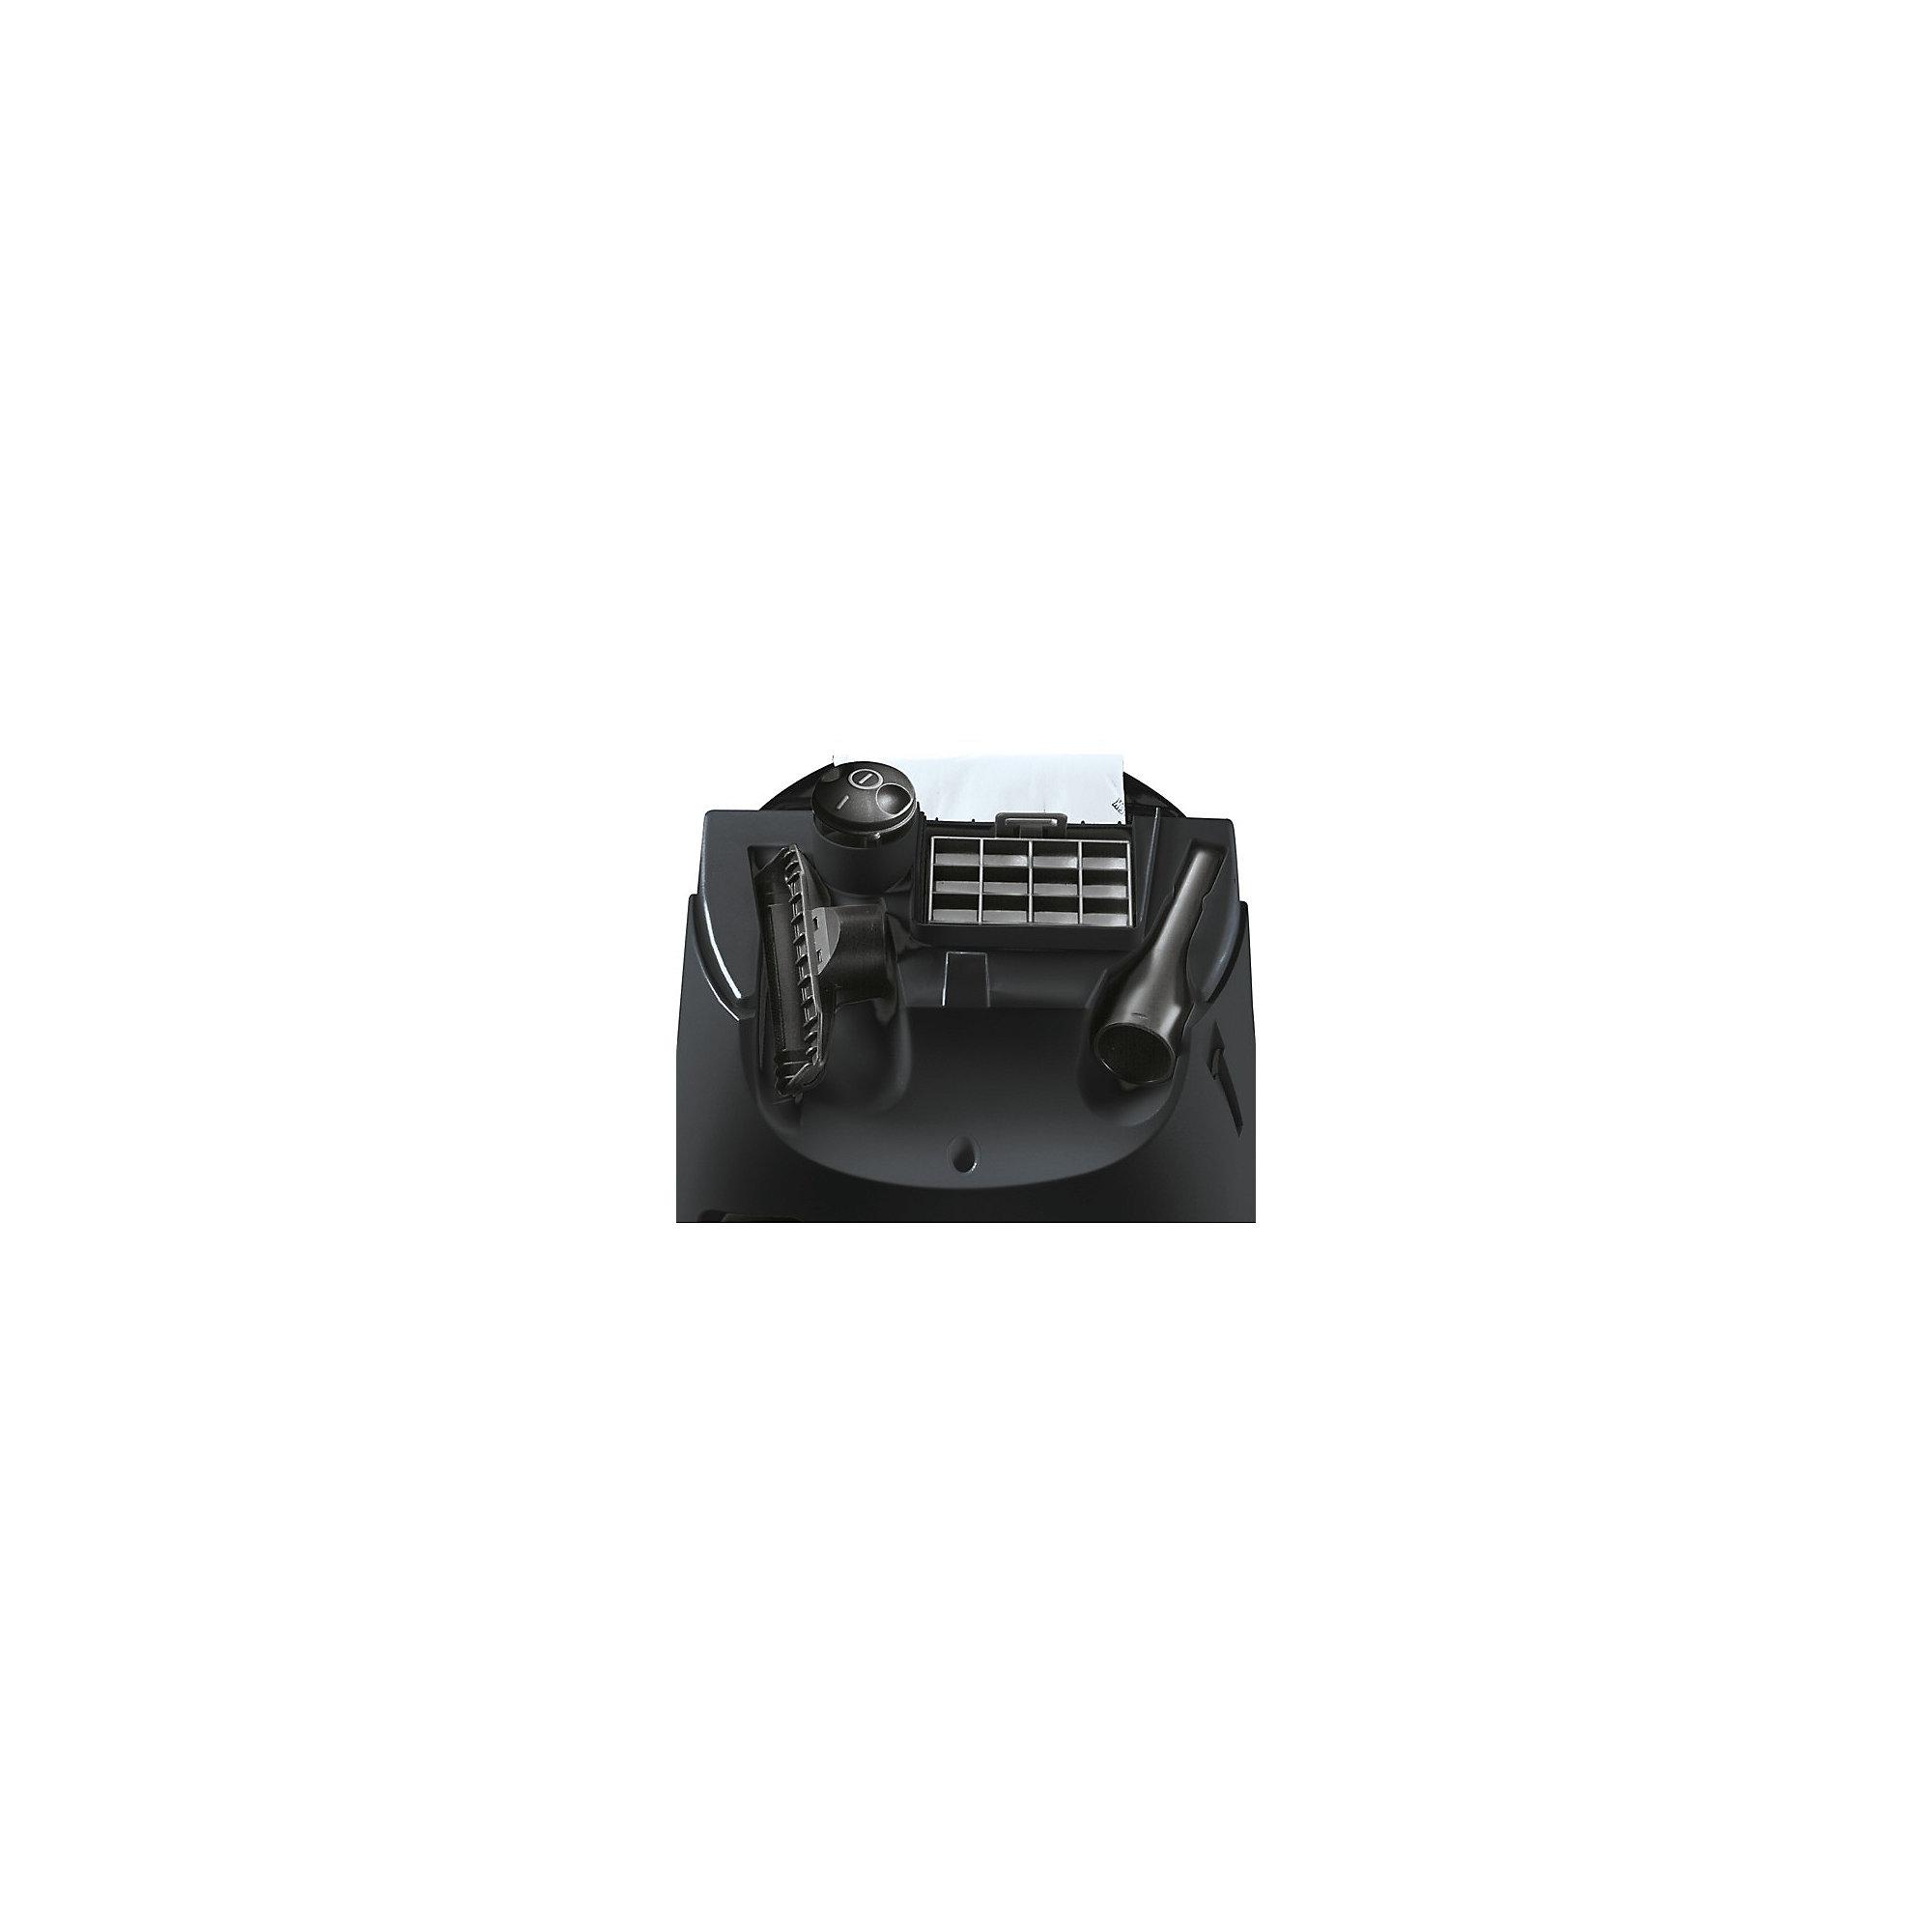 siemens vs06a111 synchropower staubsauger mit beutel eek a blau cyberport. Black Bedroom Furniture Sets. Home Design Ideas